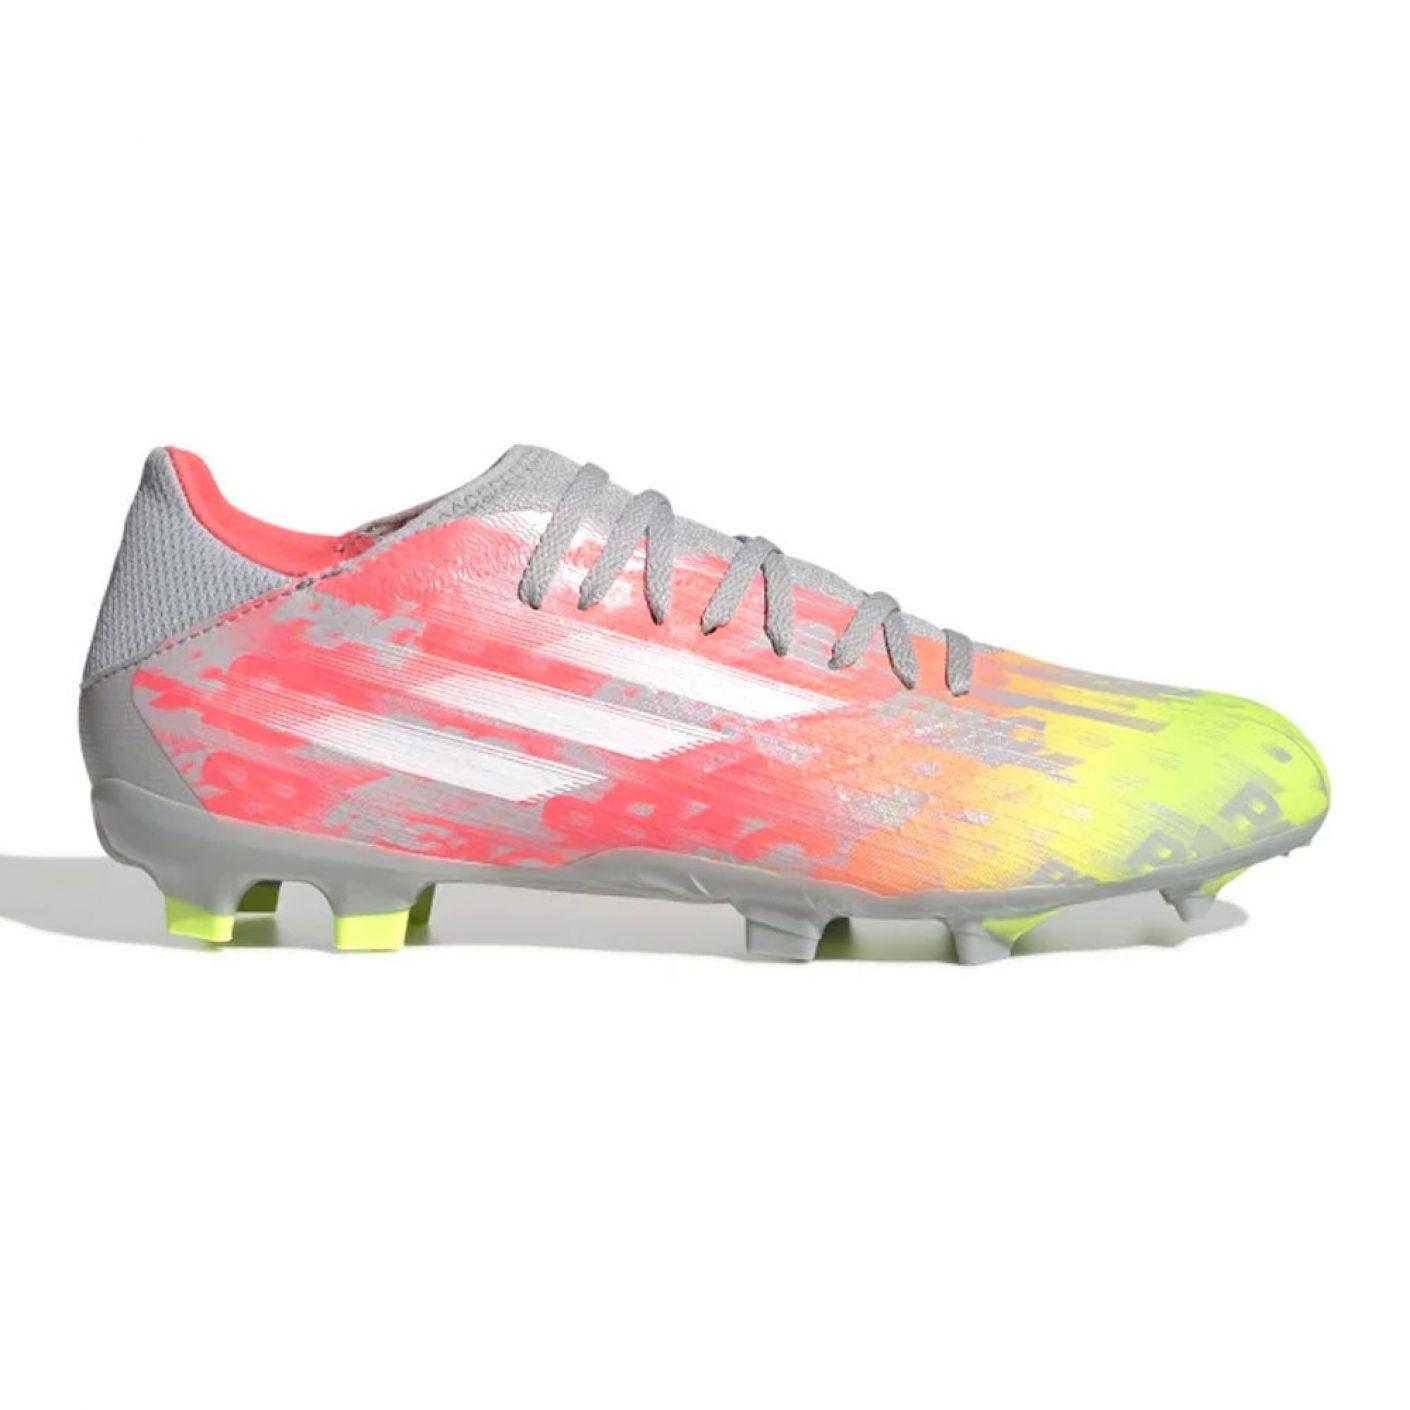 adidas X Speedflow.3 Gras Voetbalschoenen (FG) Grijs Wit Geel